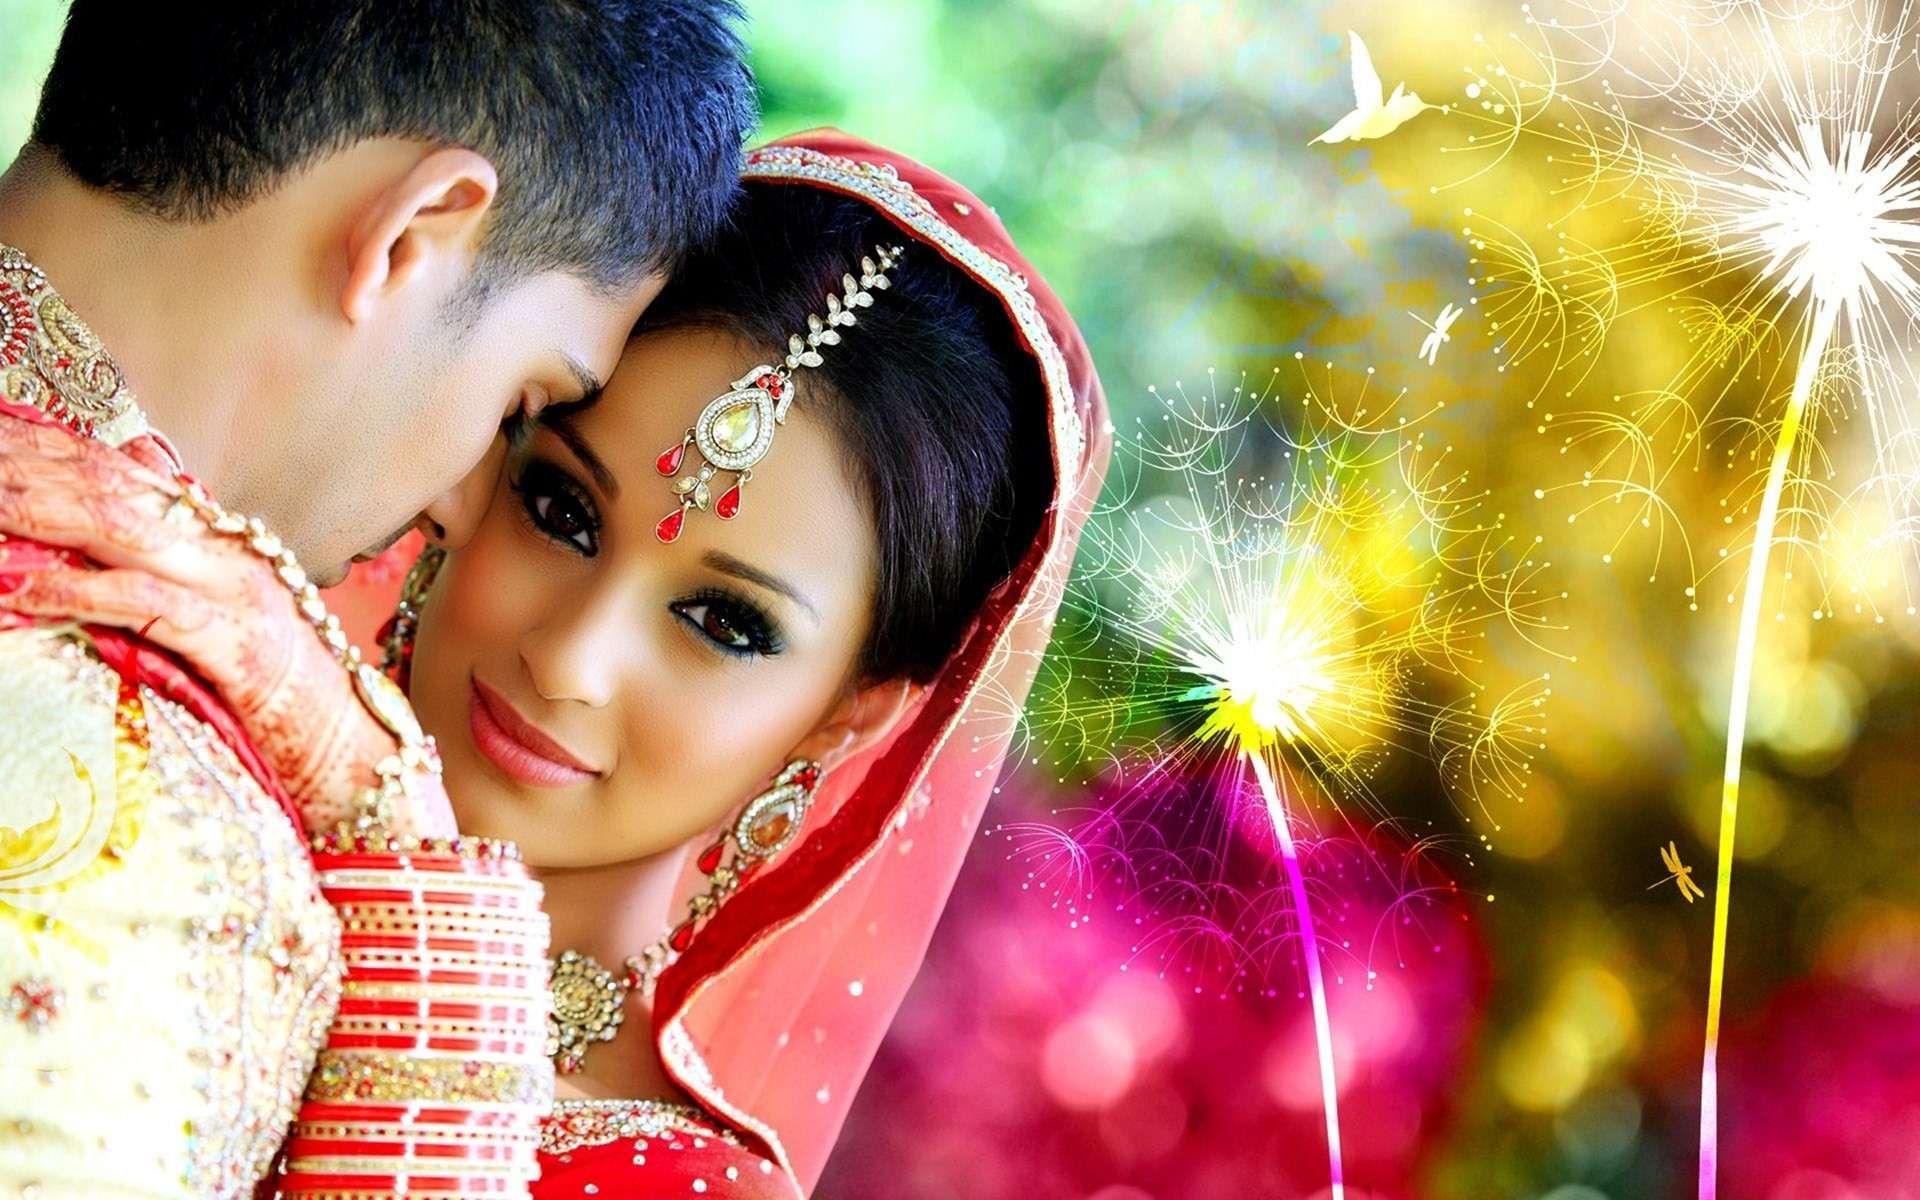 Indian Wedding Wallpaper 1080p For Hd Wallpaper Desktop 1920x1200 Px 243 33 Kb Indian Wedding Photography Wedding Photography Photography Wallpaper